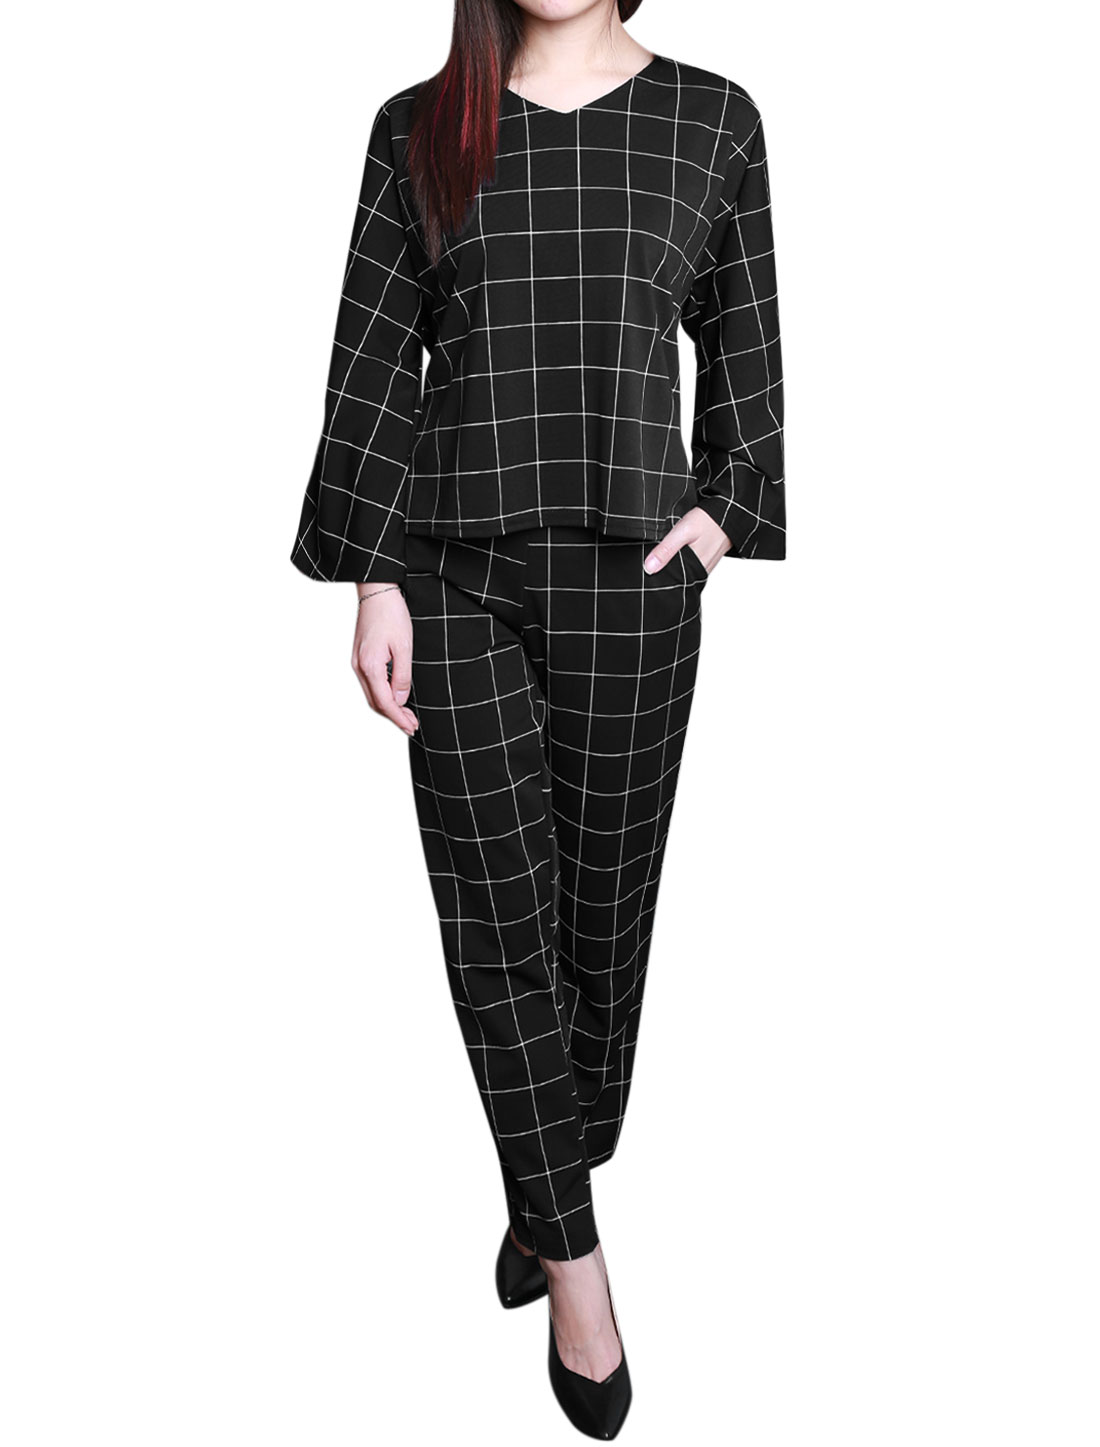 Women V Neck Dolman Sleeves Top w Plaids Casual Pants Sets Black XS